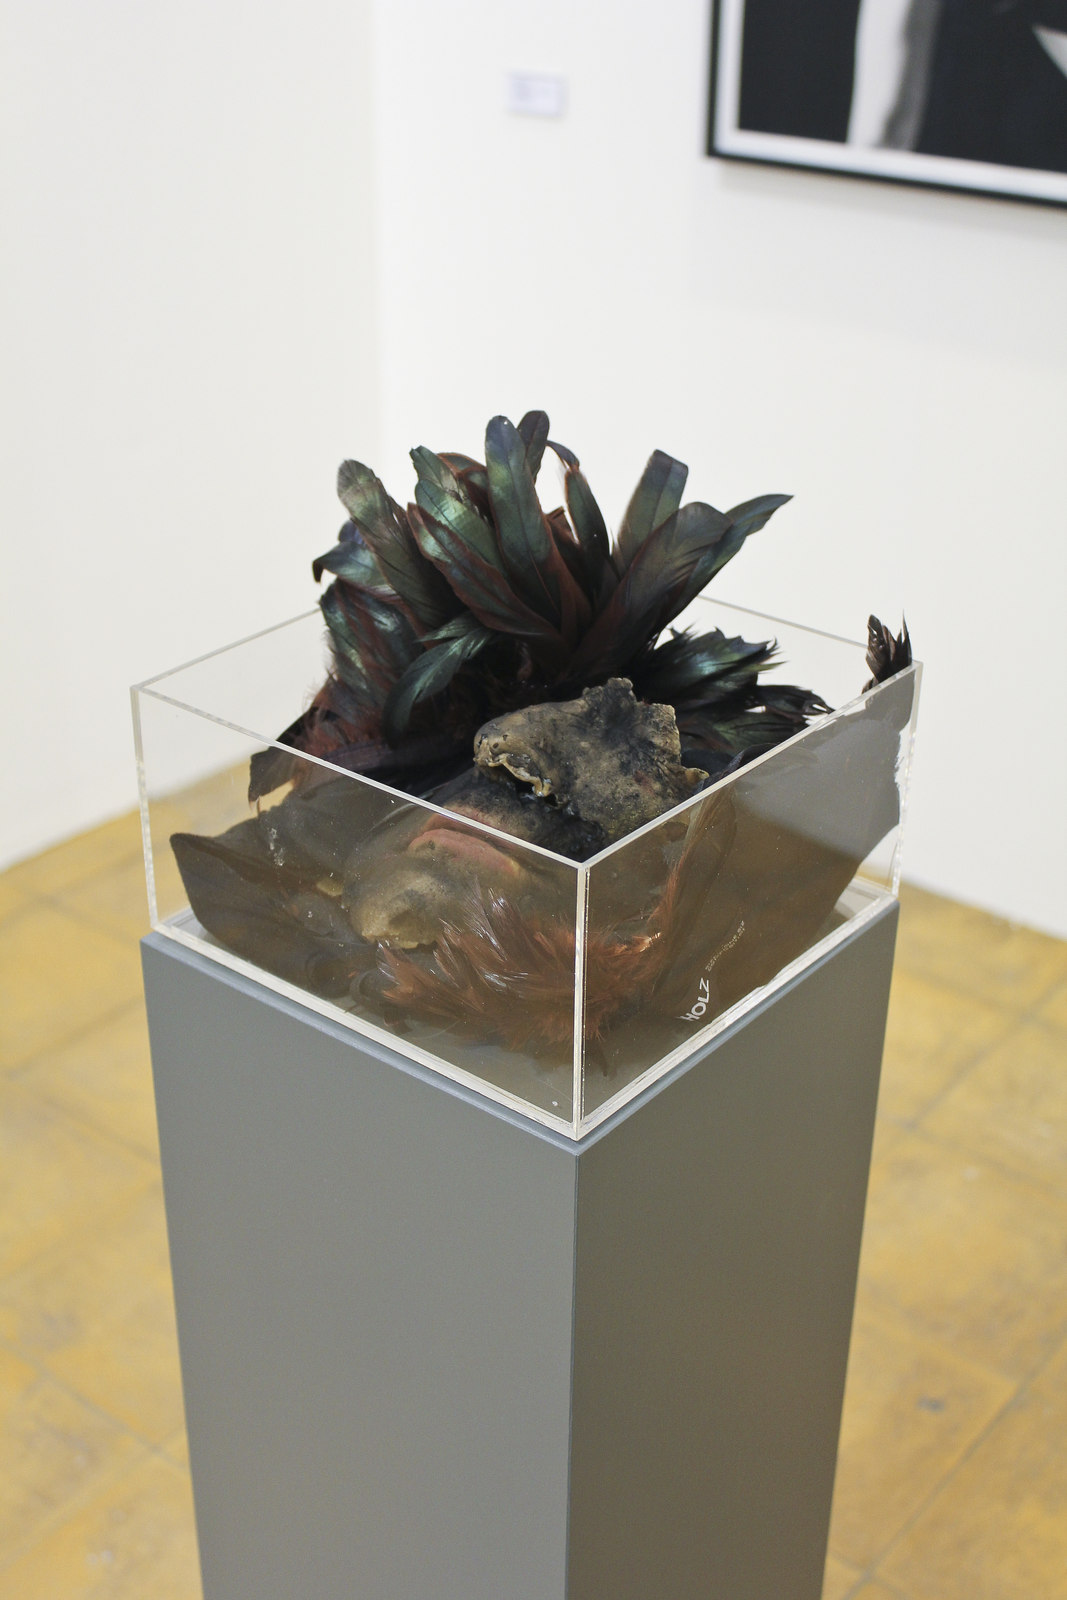 Lynn Hershman Leeson at Vilma Gold, London 10